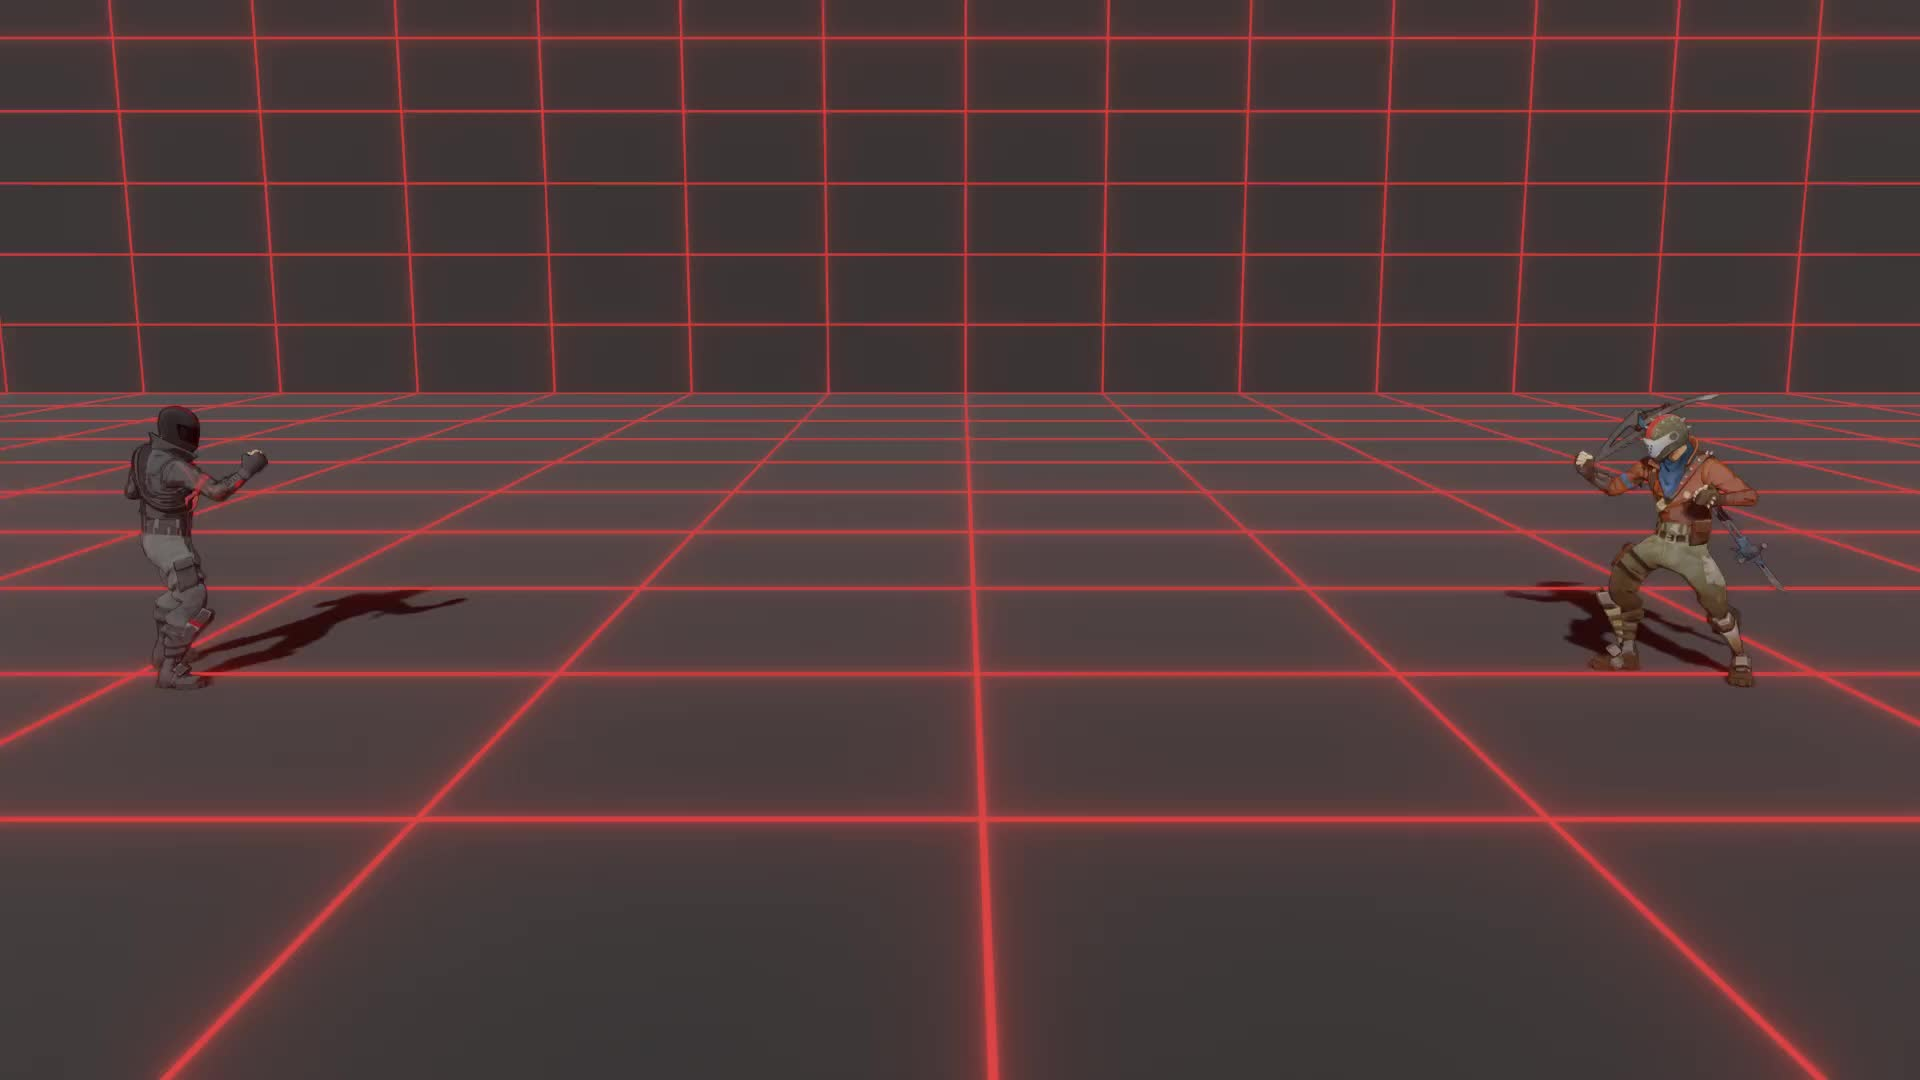 ▷ Lonk Dance wip GIF by salazar - Find & Download & Share